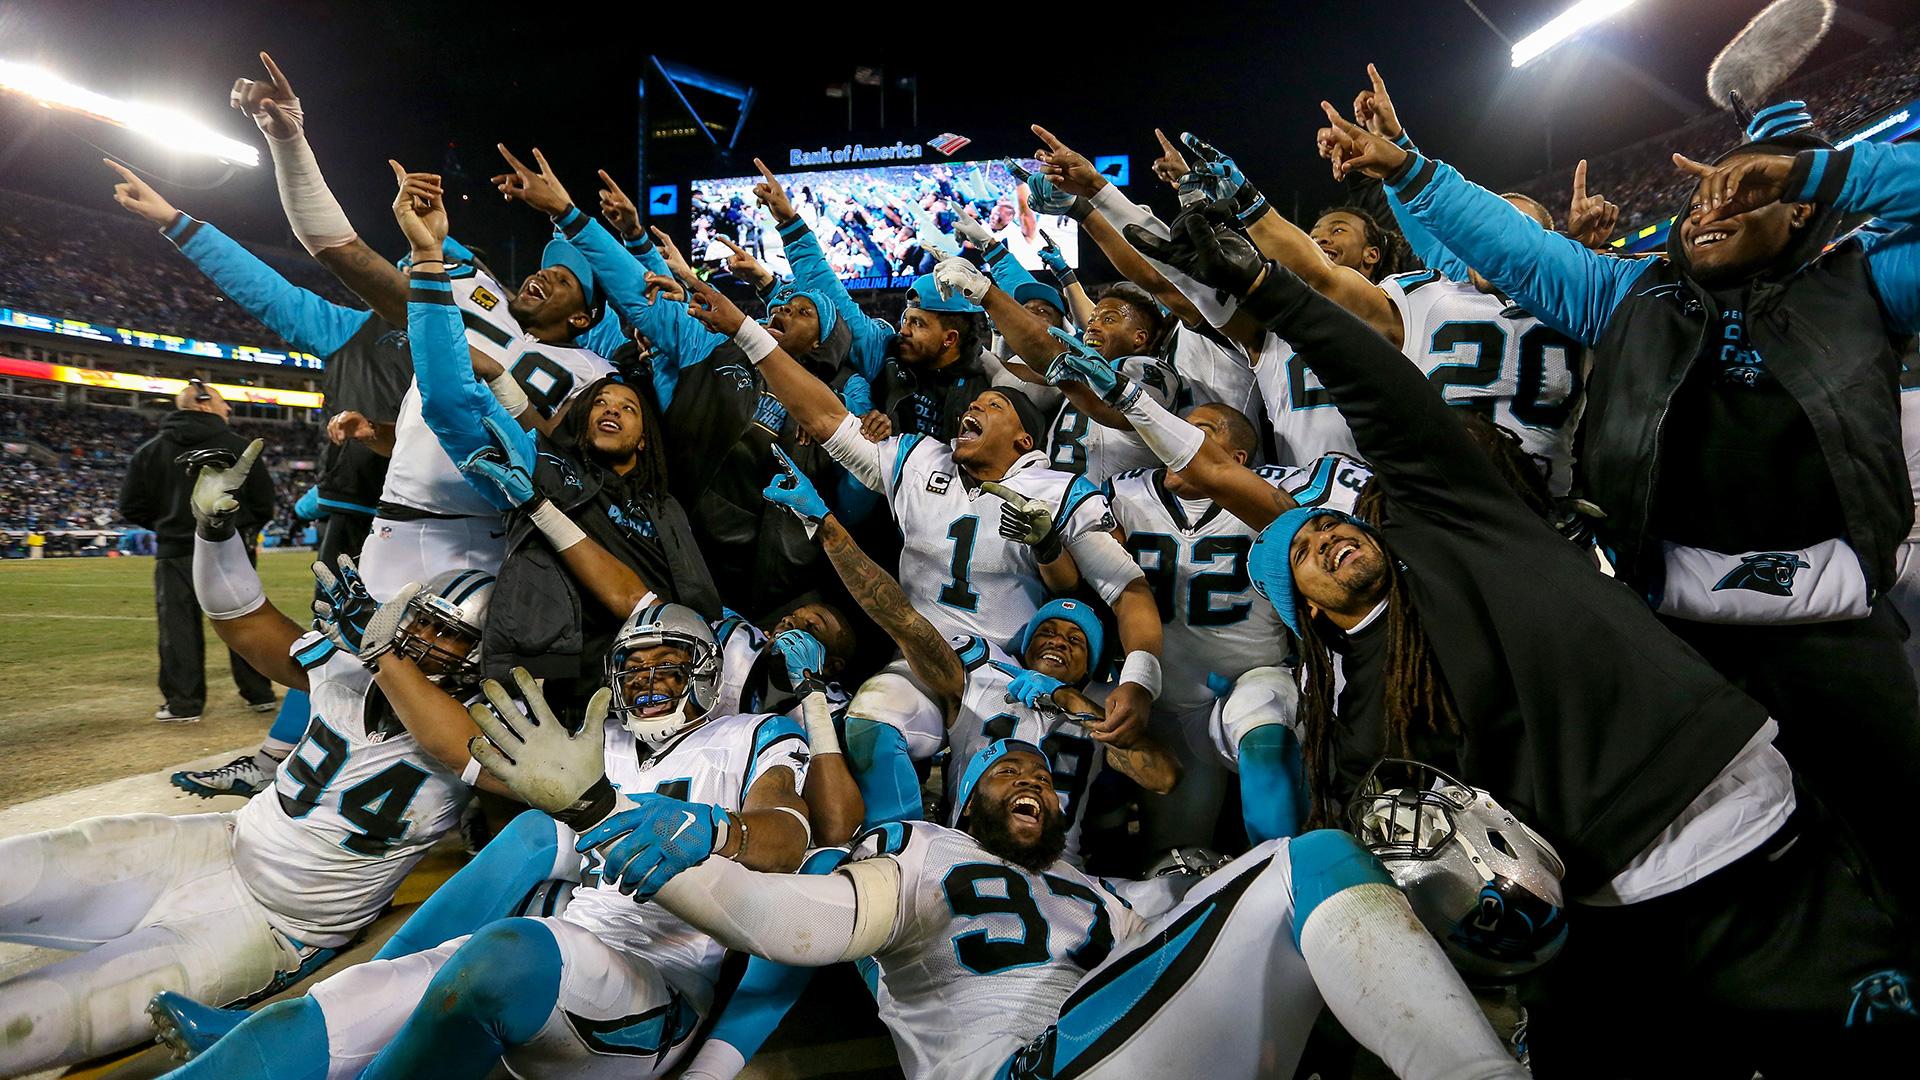 [NFL] NFC Championship Game: il ruggito delle pantere (Arizona Cardinals vs Carolina Panthers 15-49)